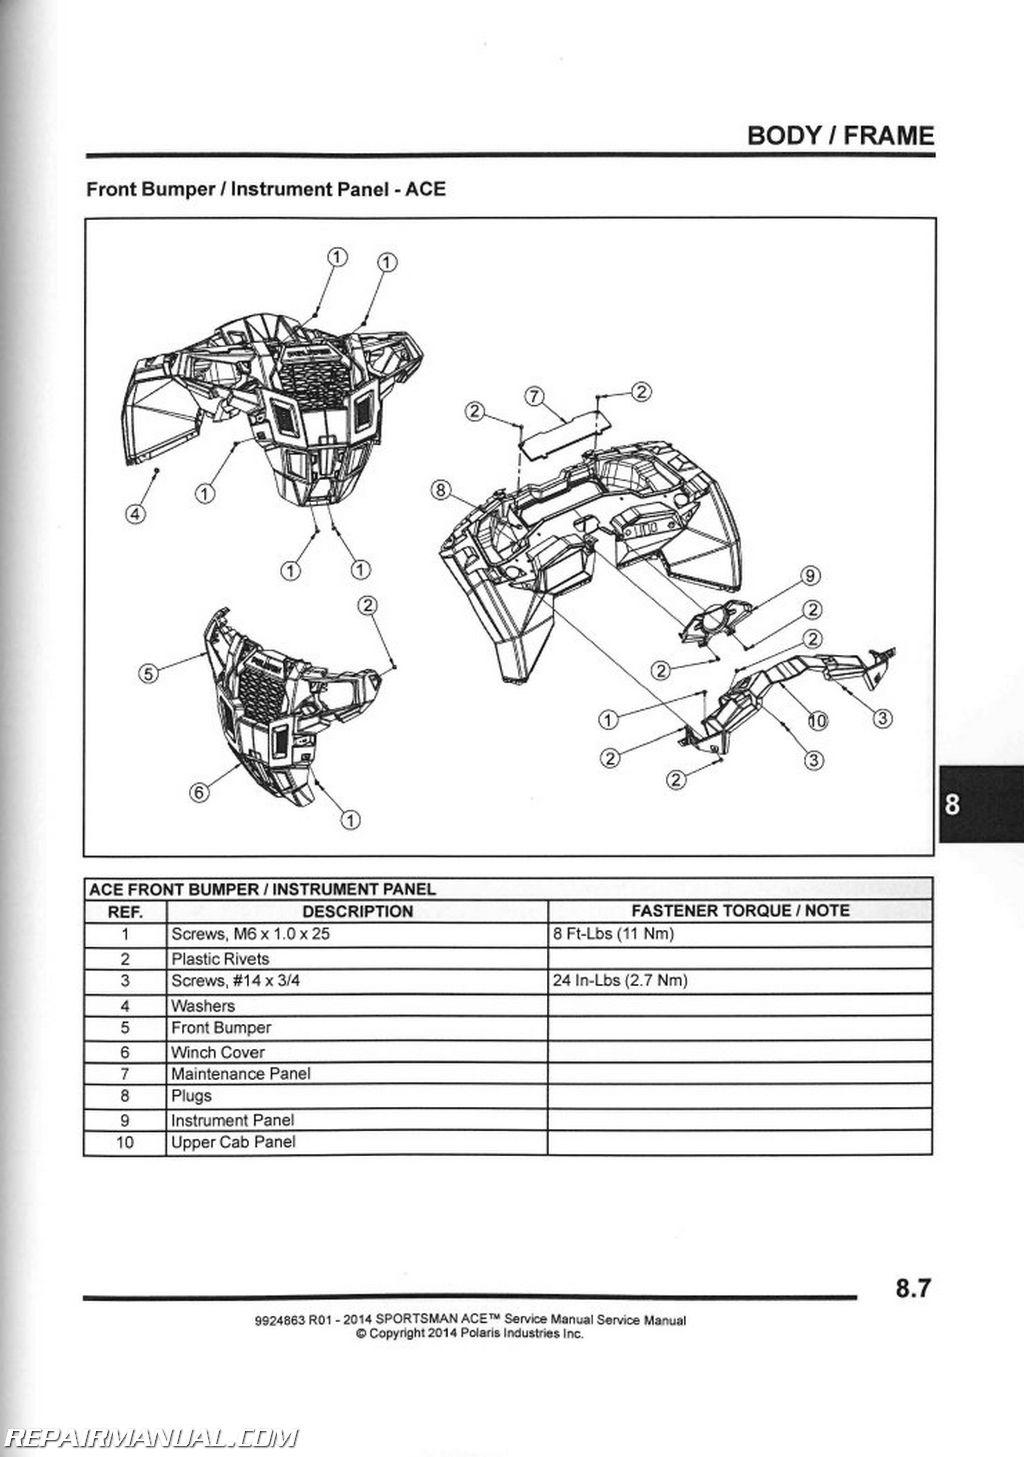 525 S Polaris Carb Diagram Free Download Wiring Diagram Schematic